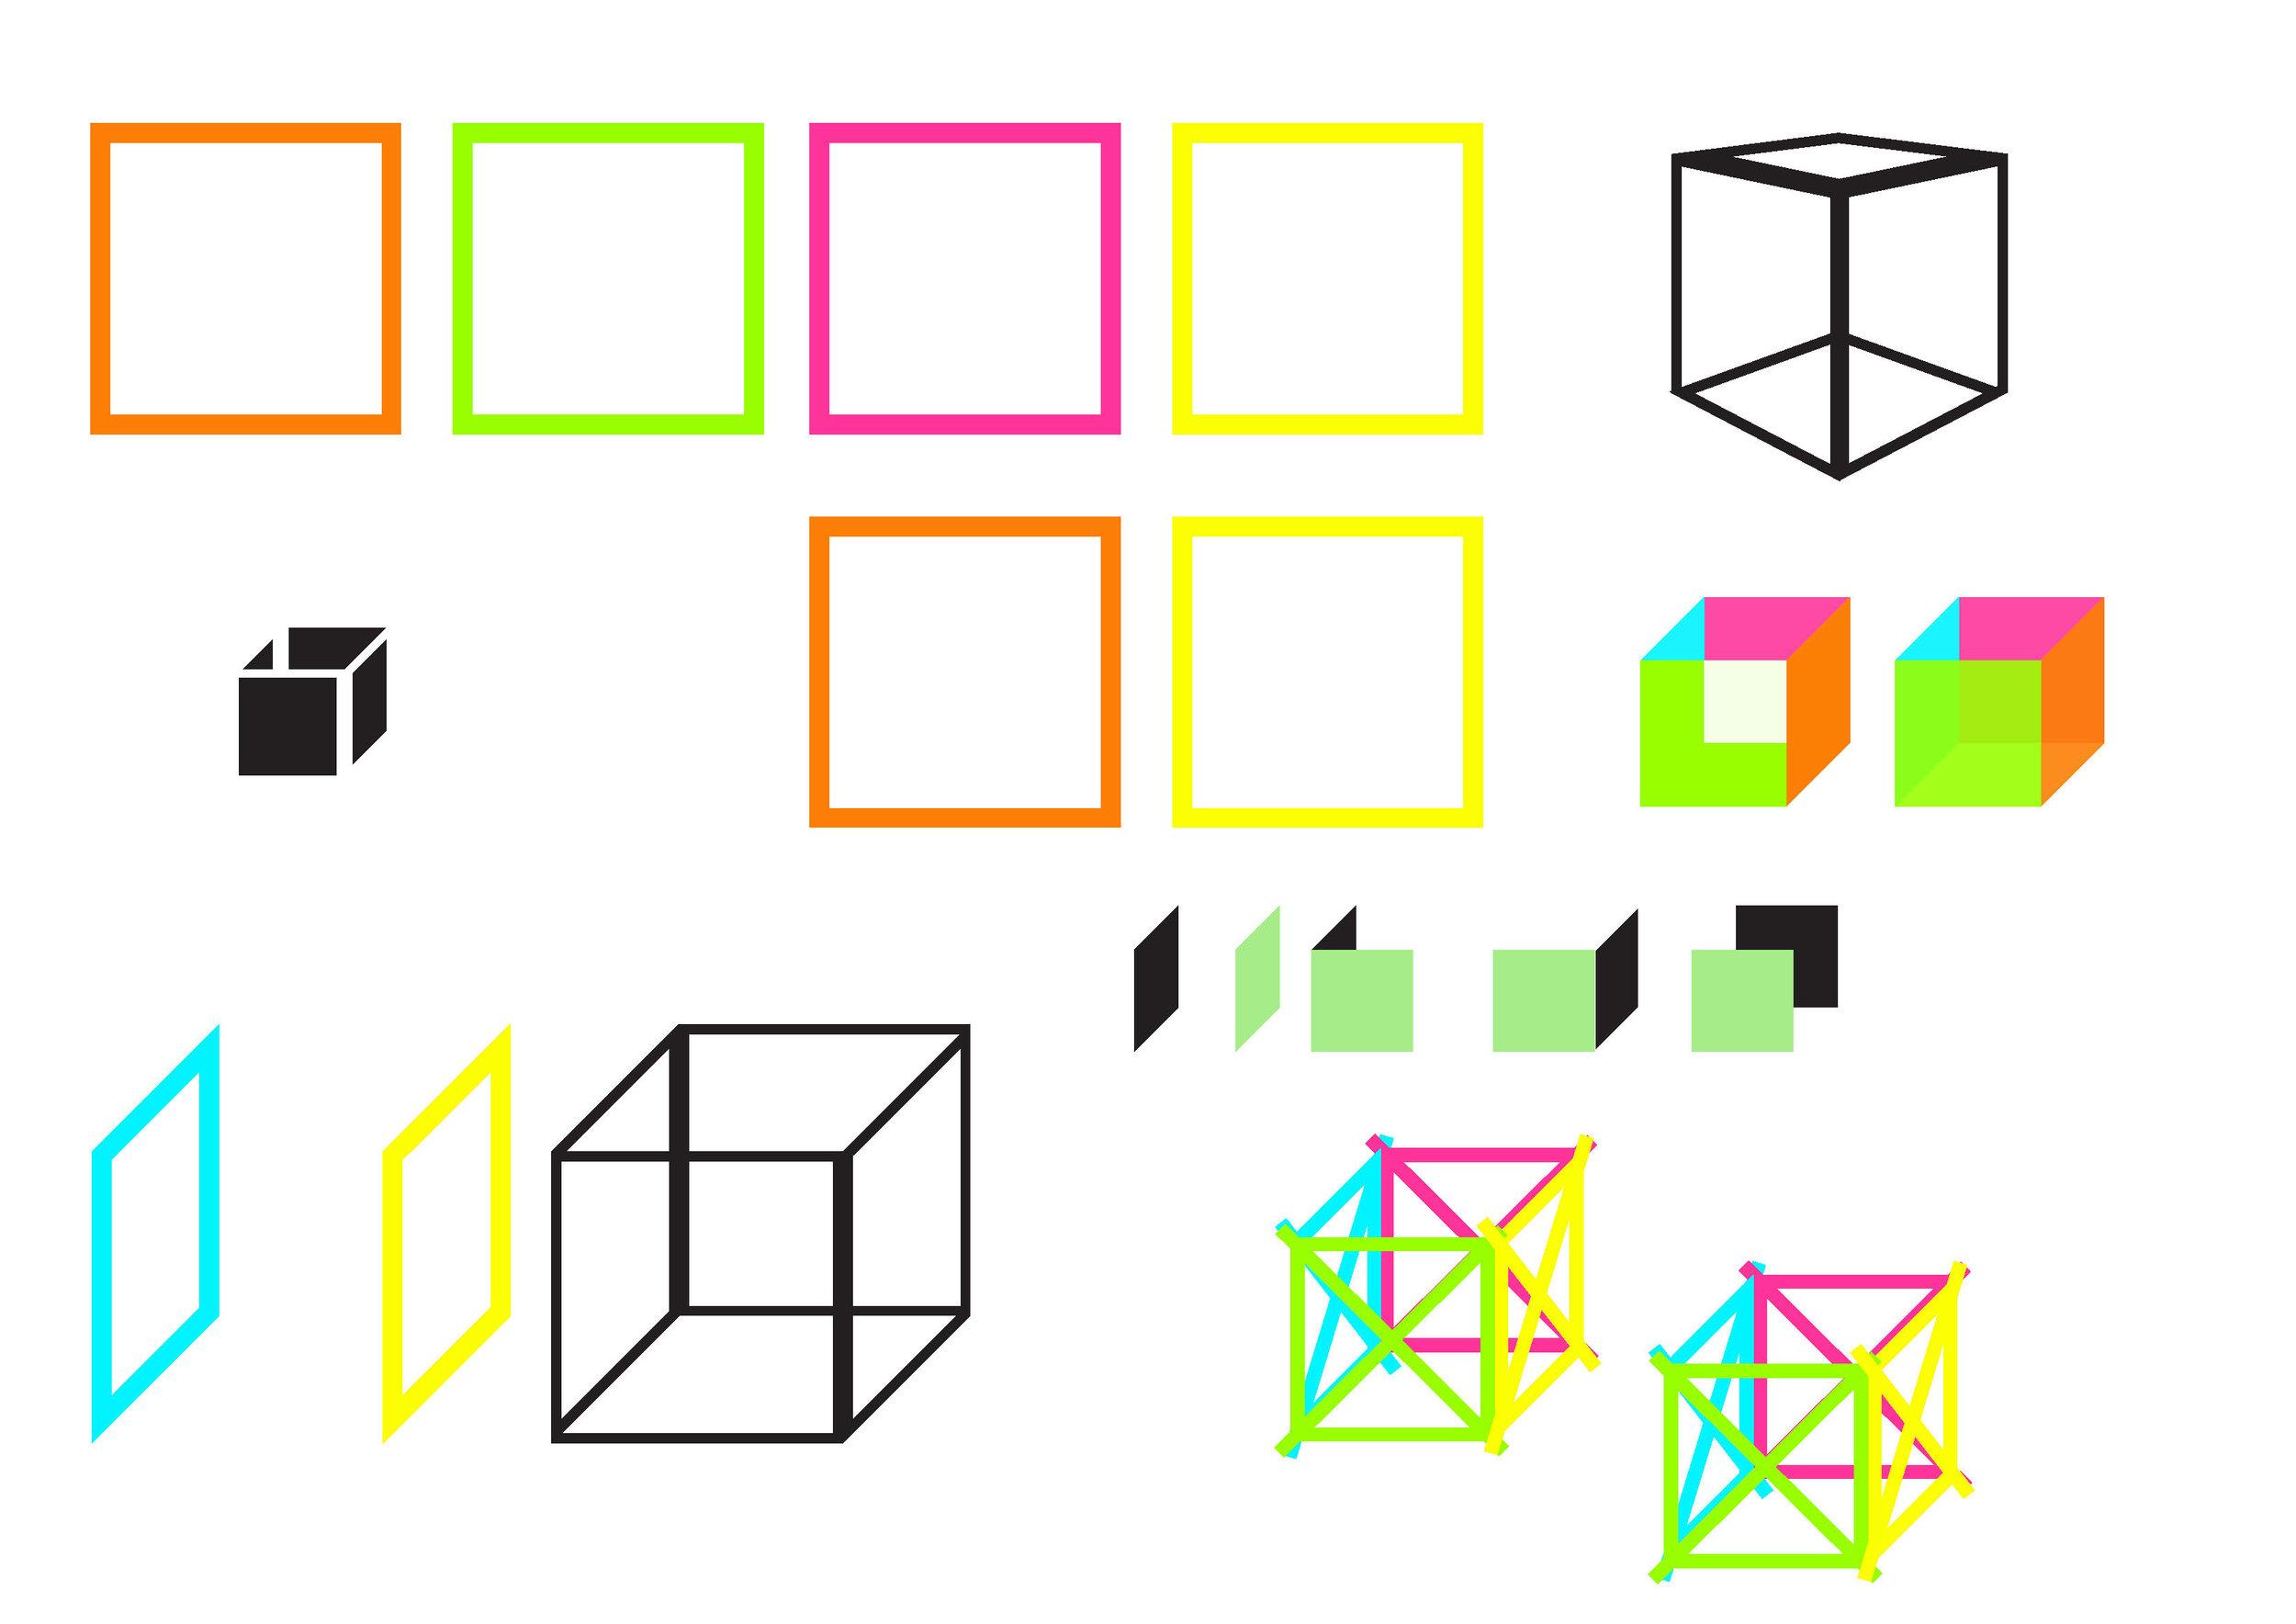 betterlogodesign_number1 copy.jpg